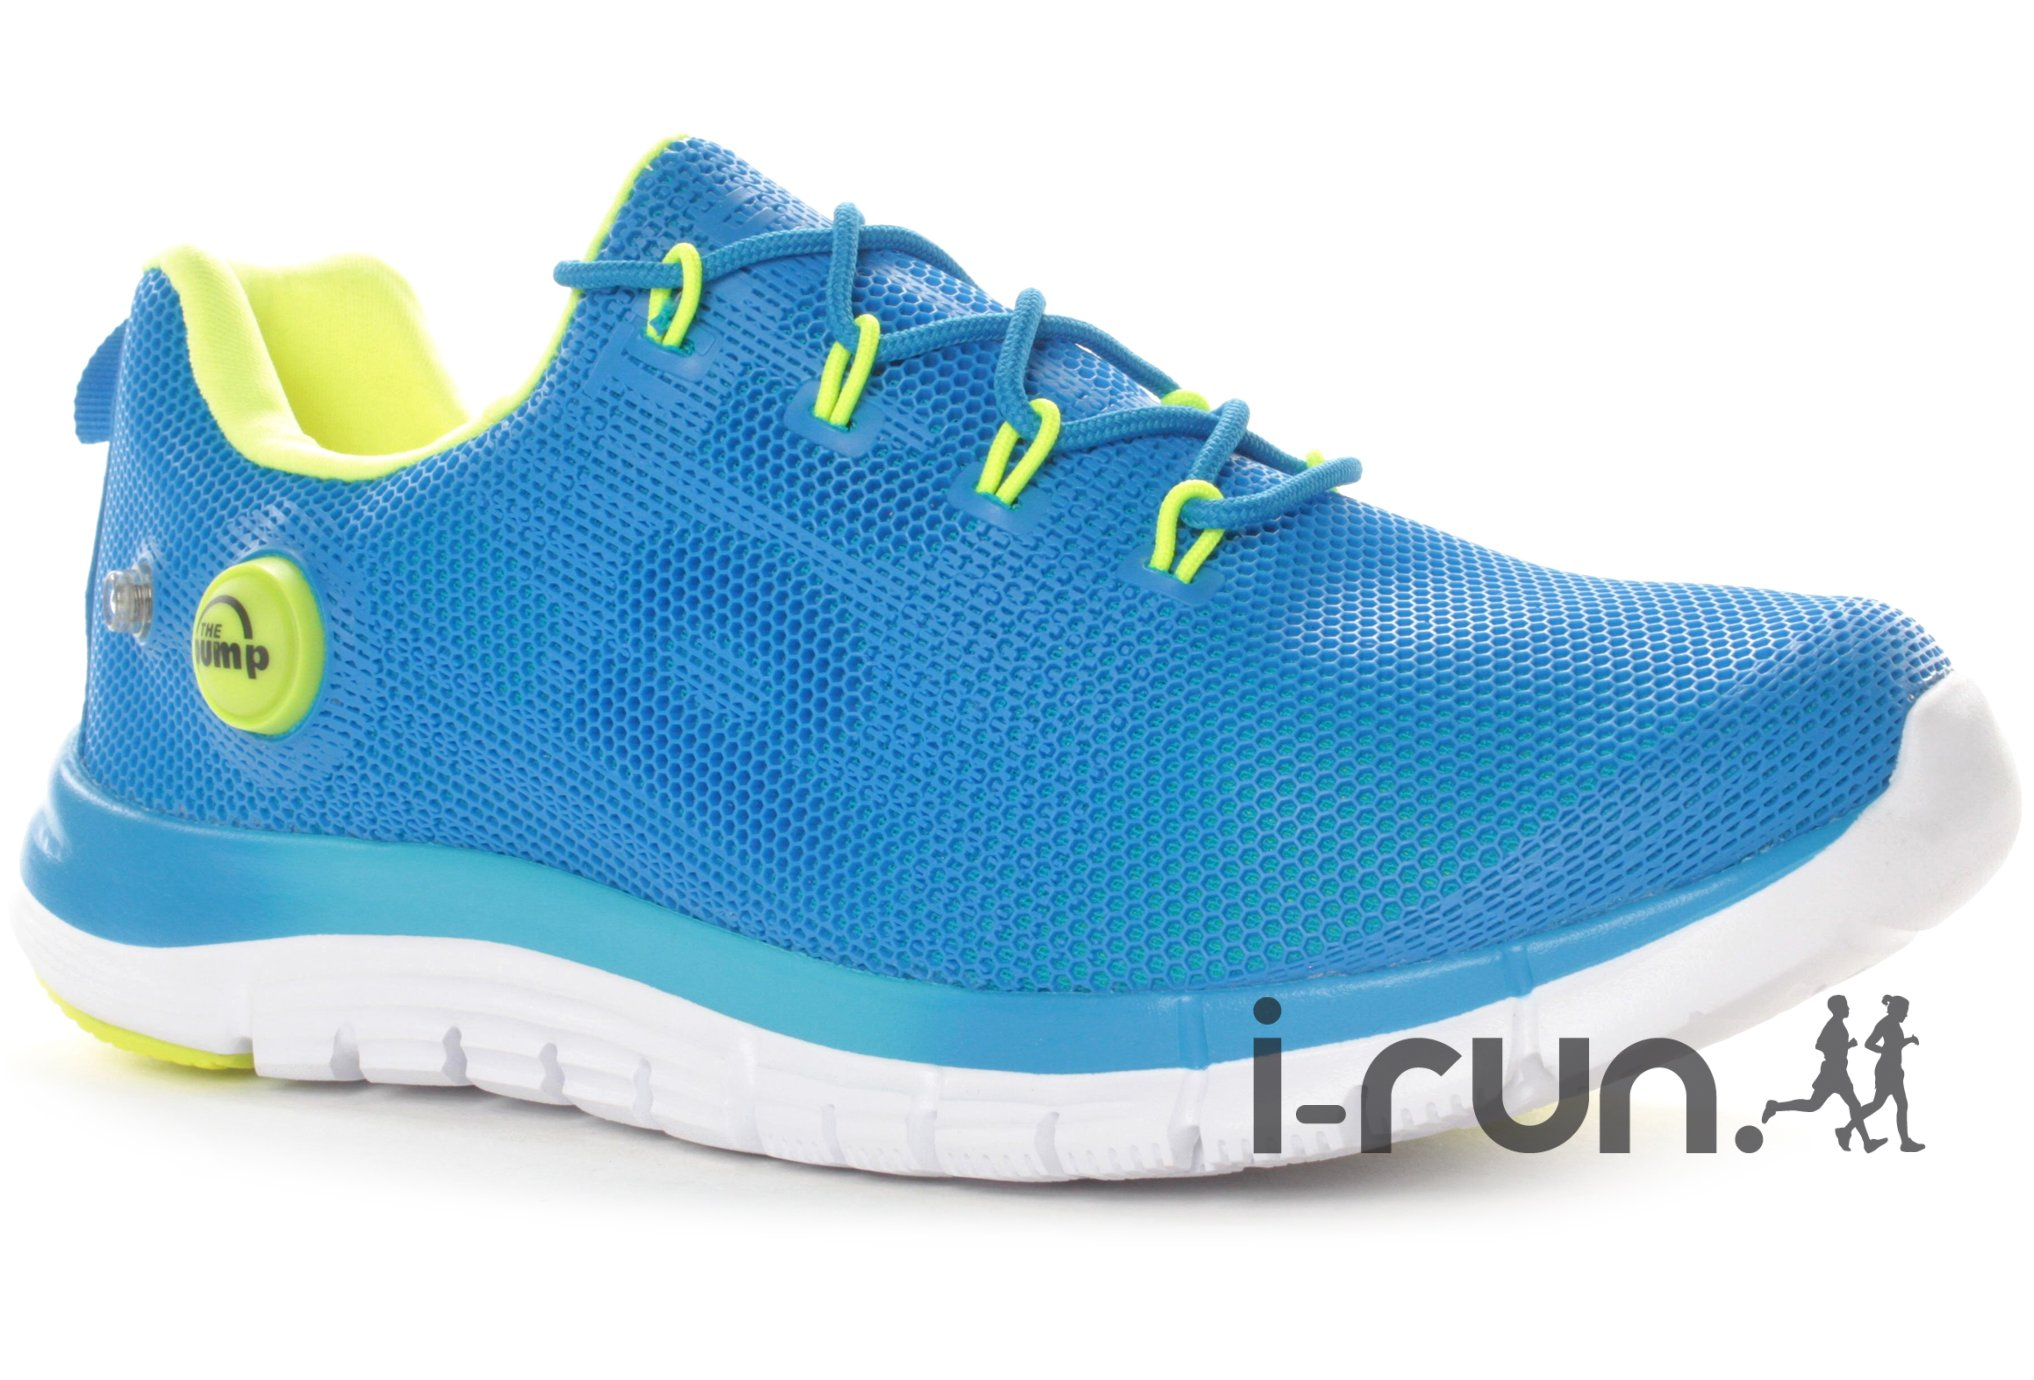 Reebok ZPump Fusion PU W Diététique Chaussures femme